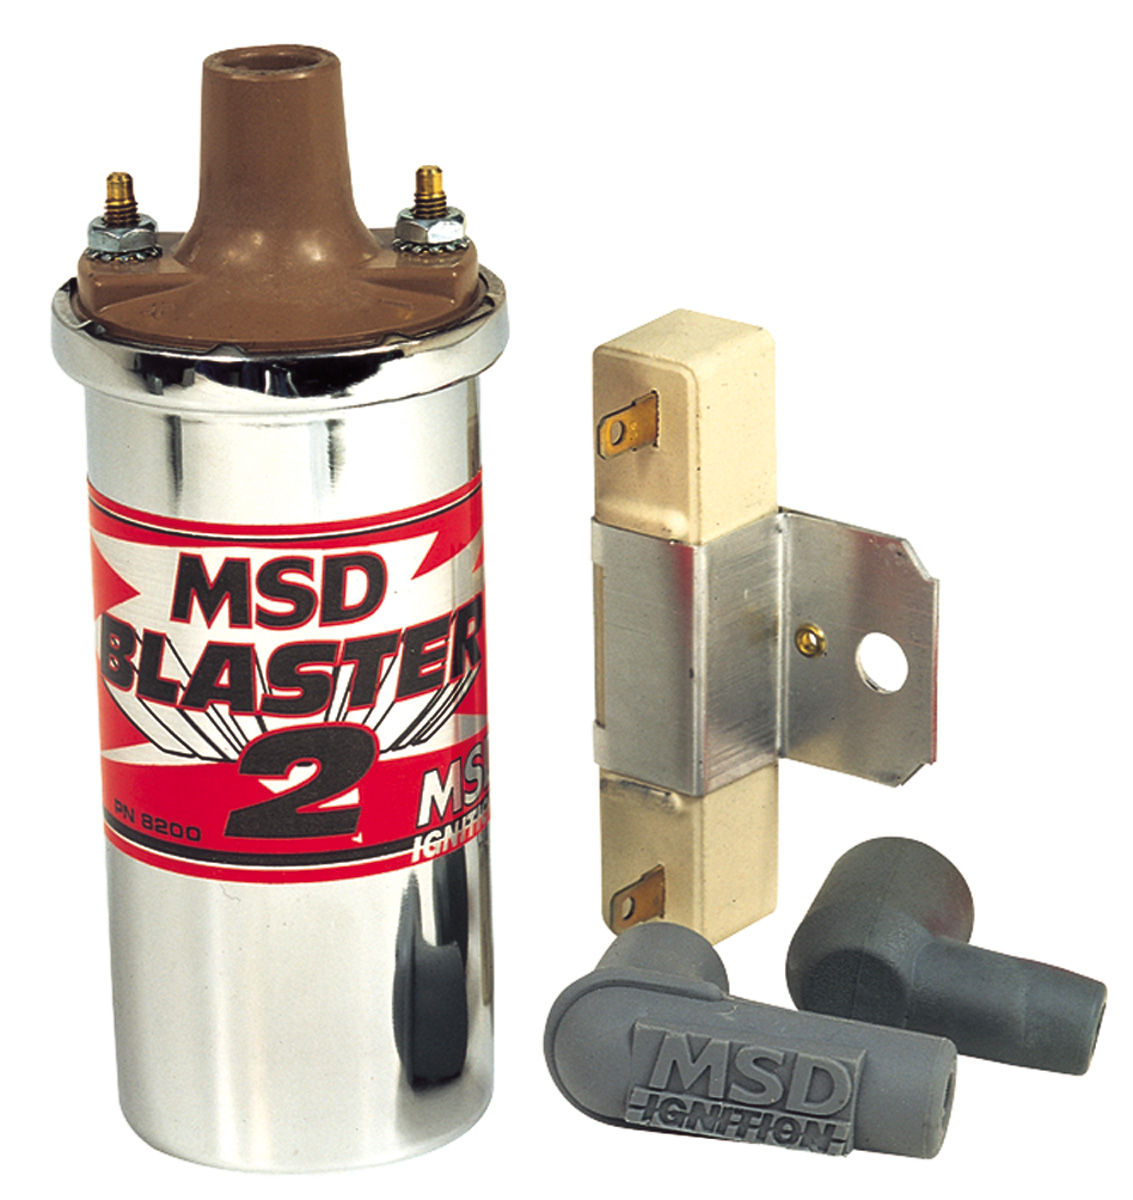 Photo of Ignition Coil Kit, Blaster 2 Points chrome coil